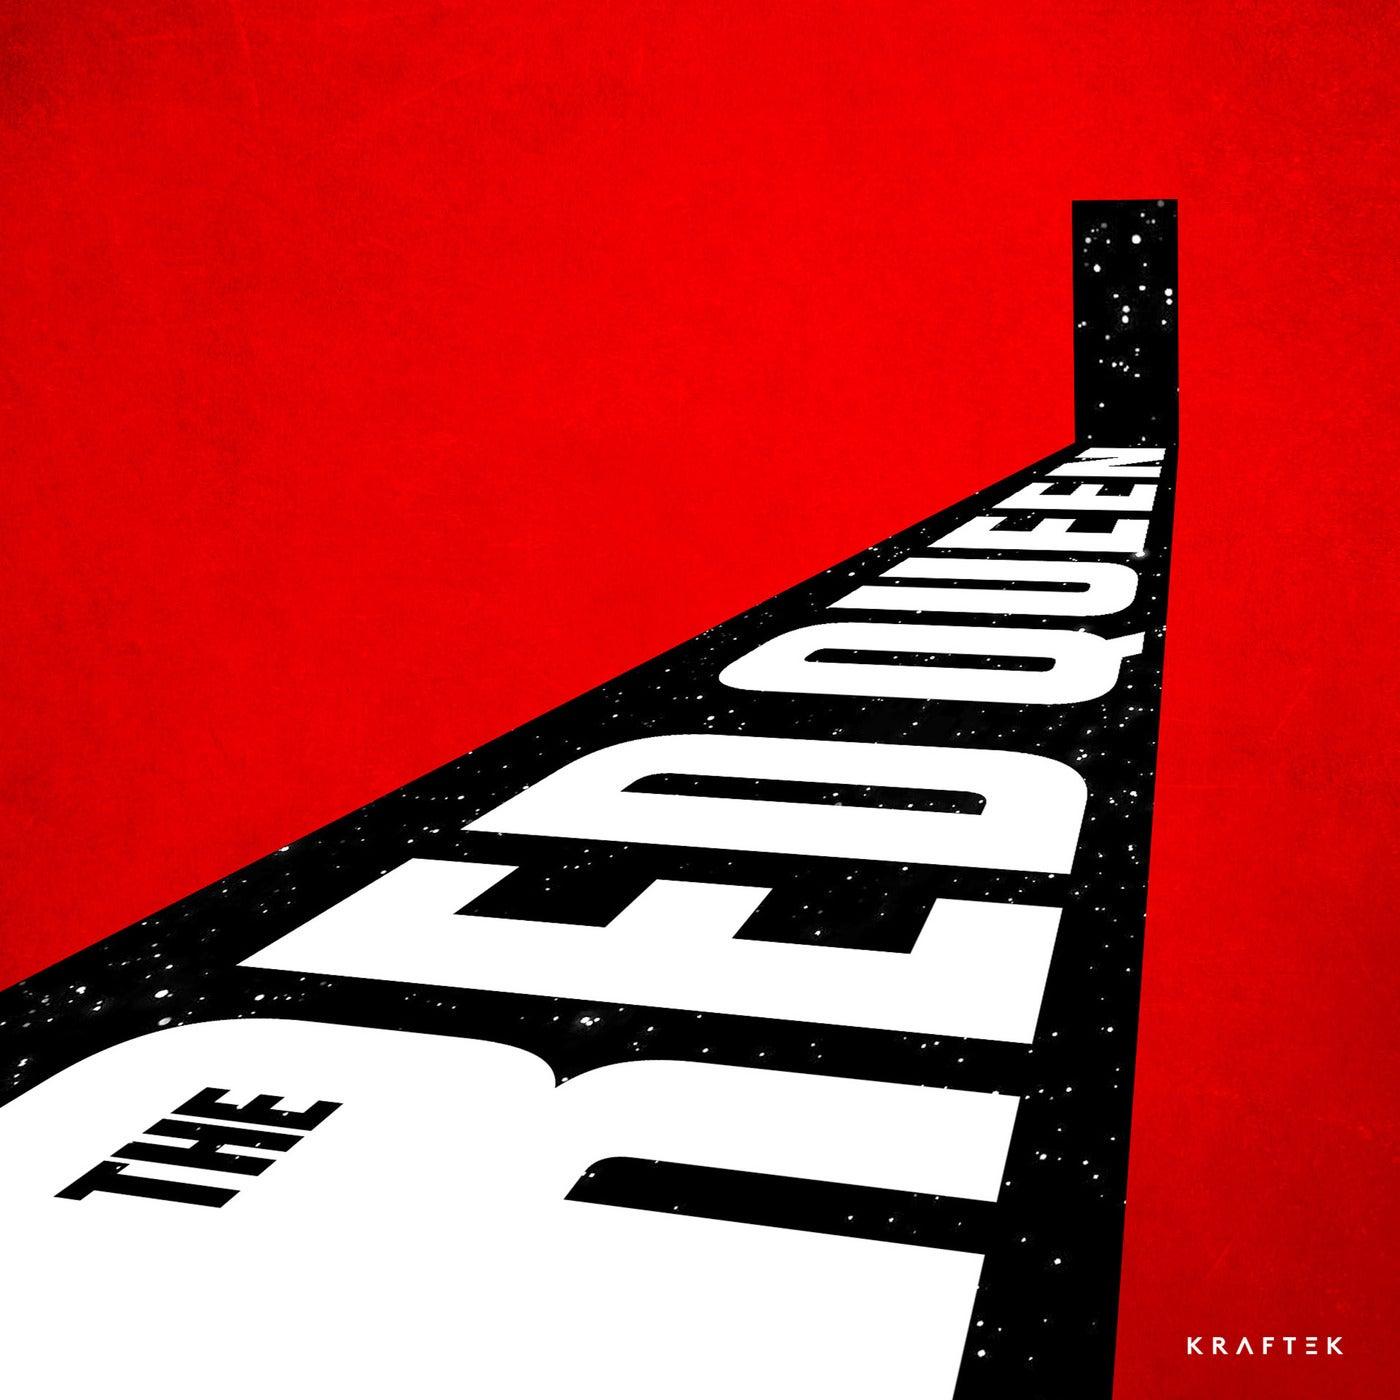 The Red Queen (Original Mix)